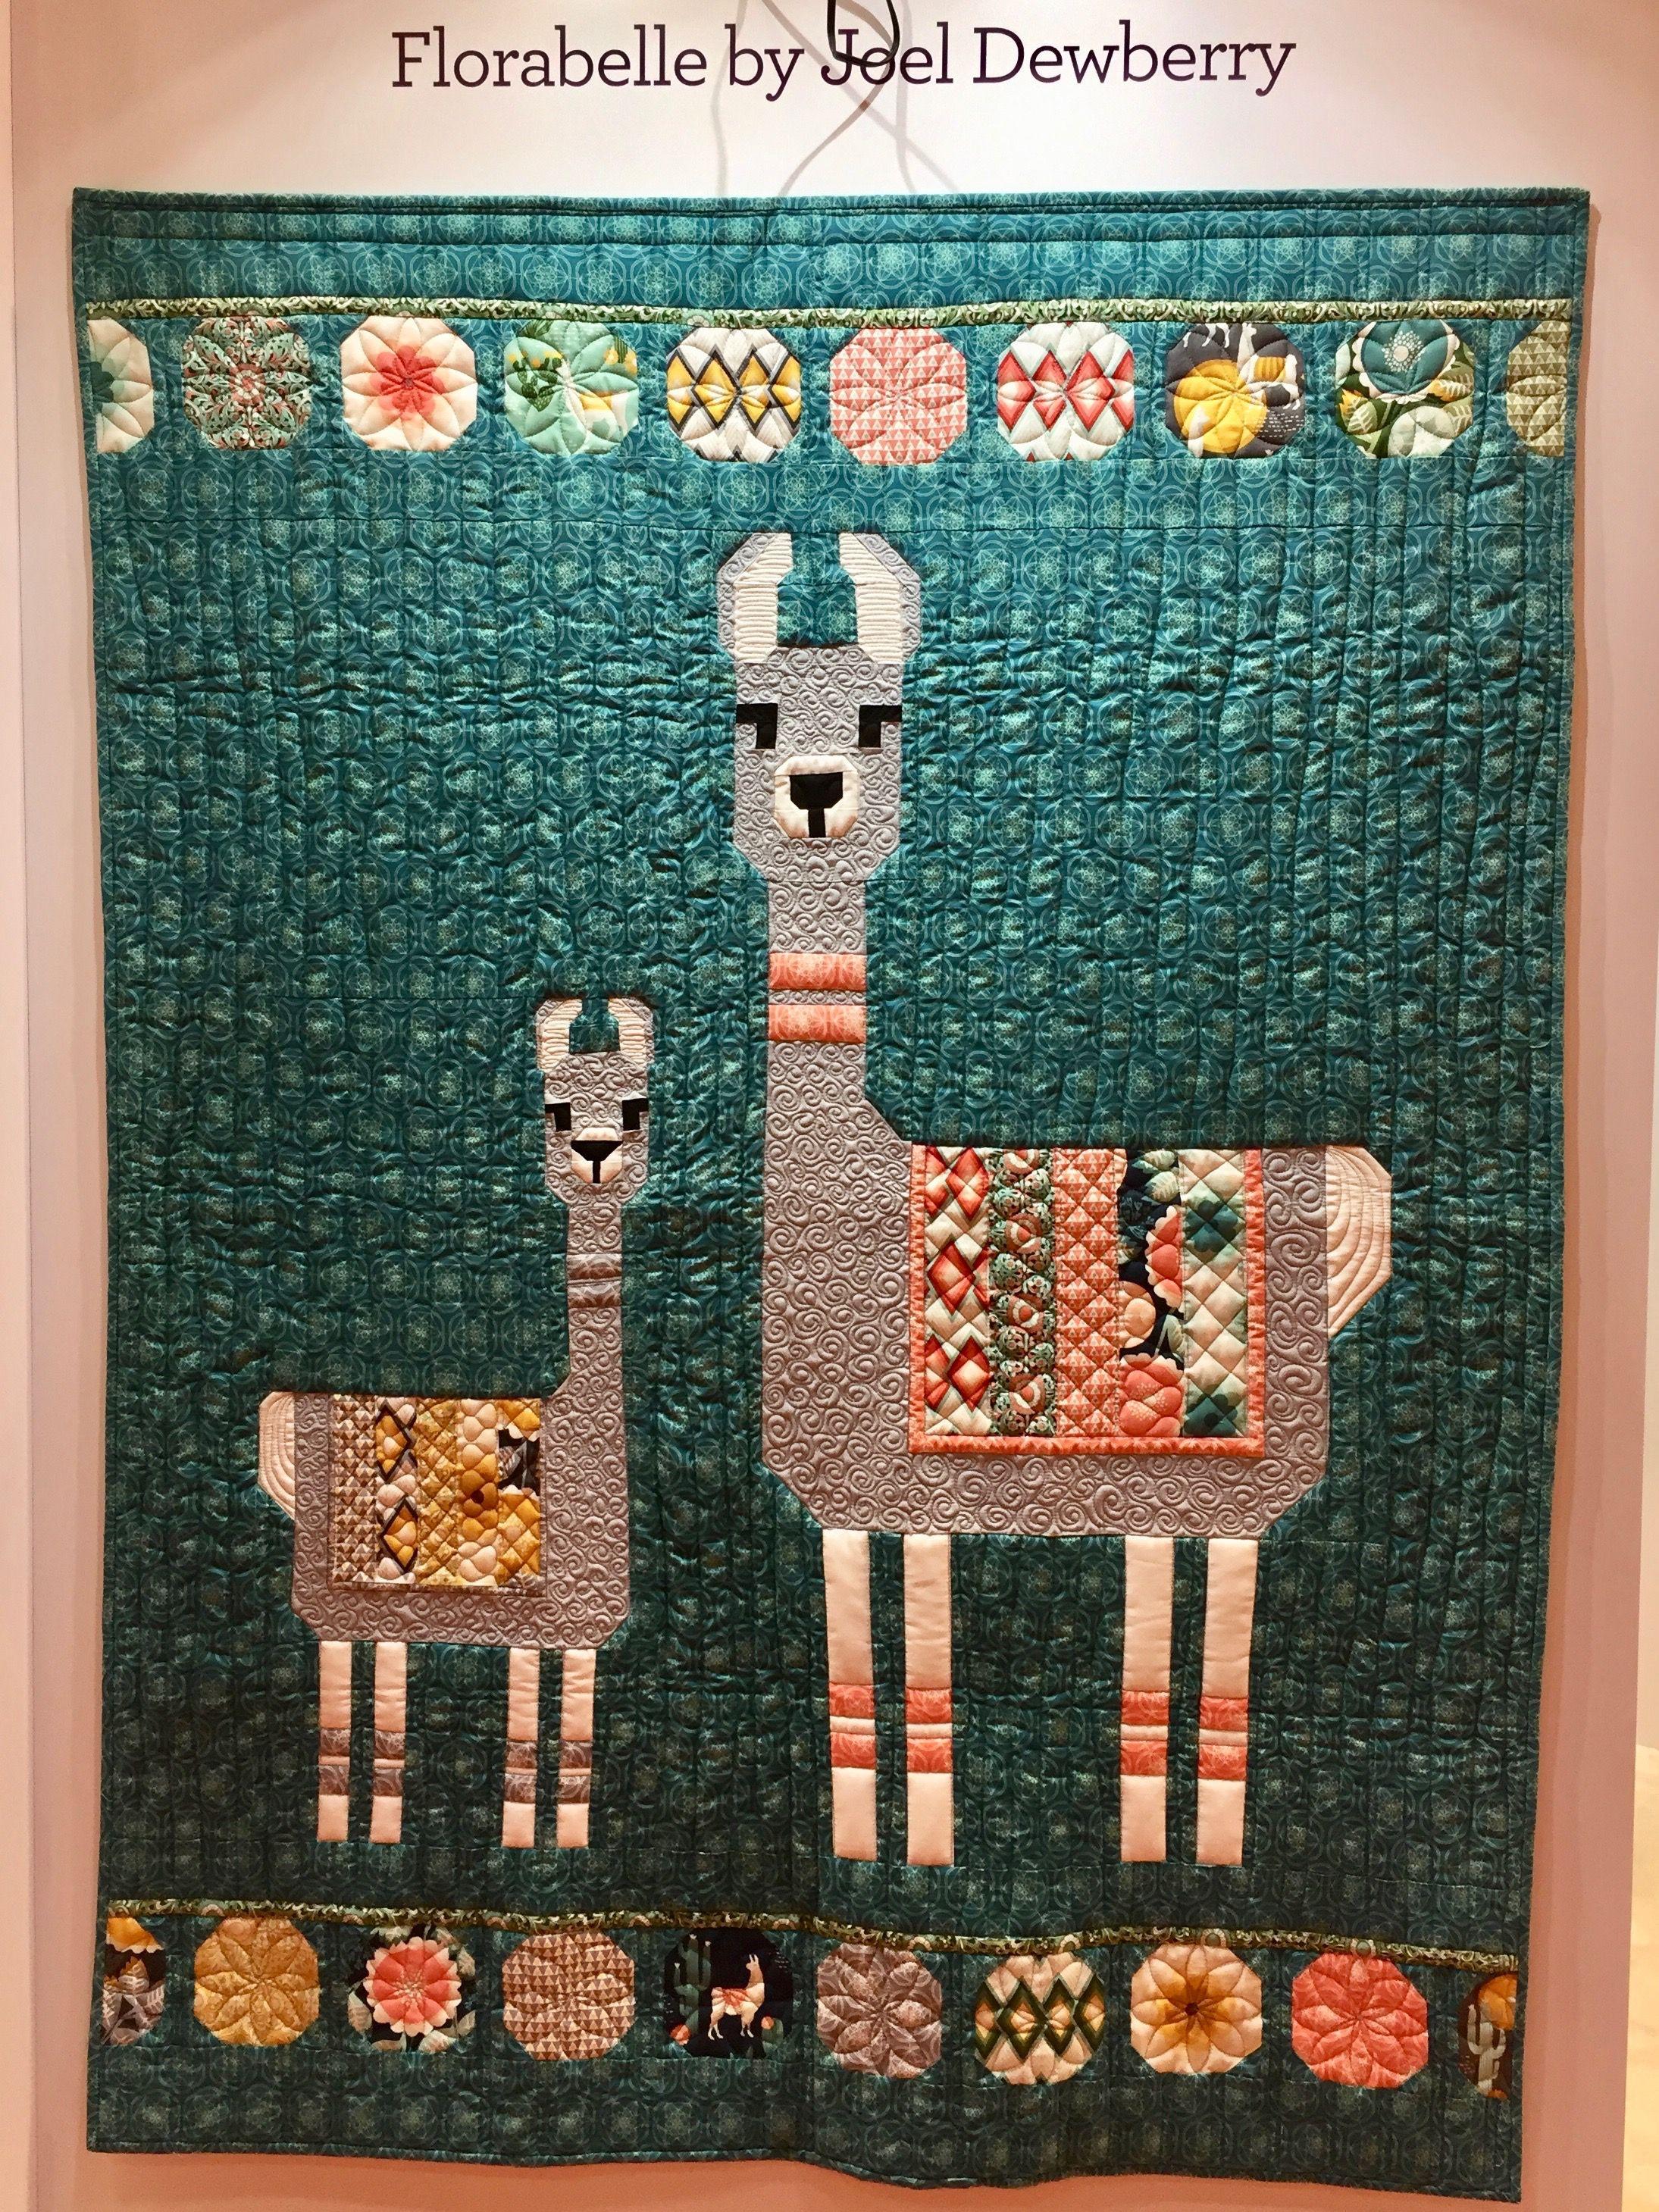 Llama Quilt Florabelle By Joel Dewberry Spring Market